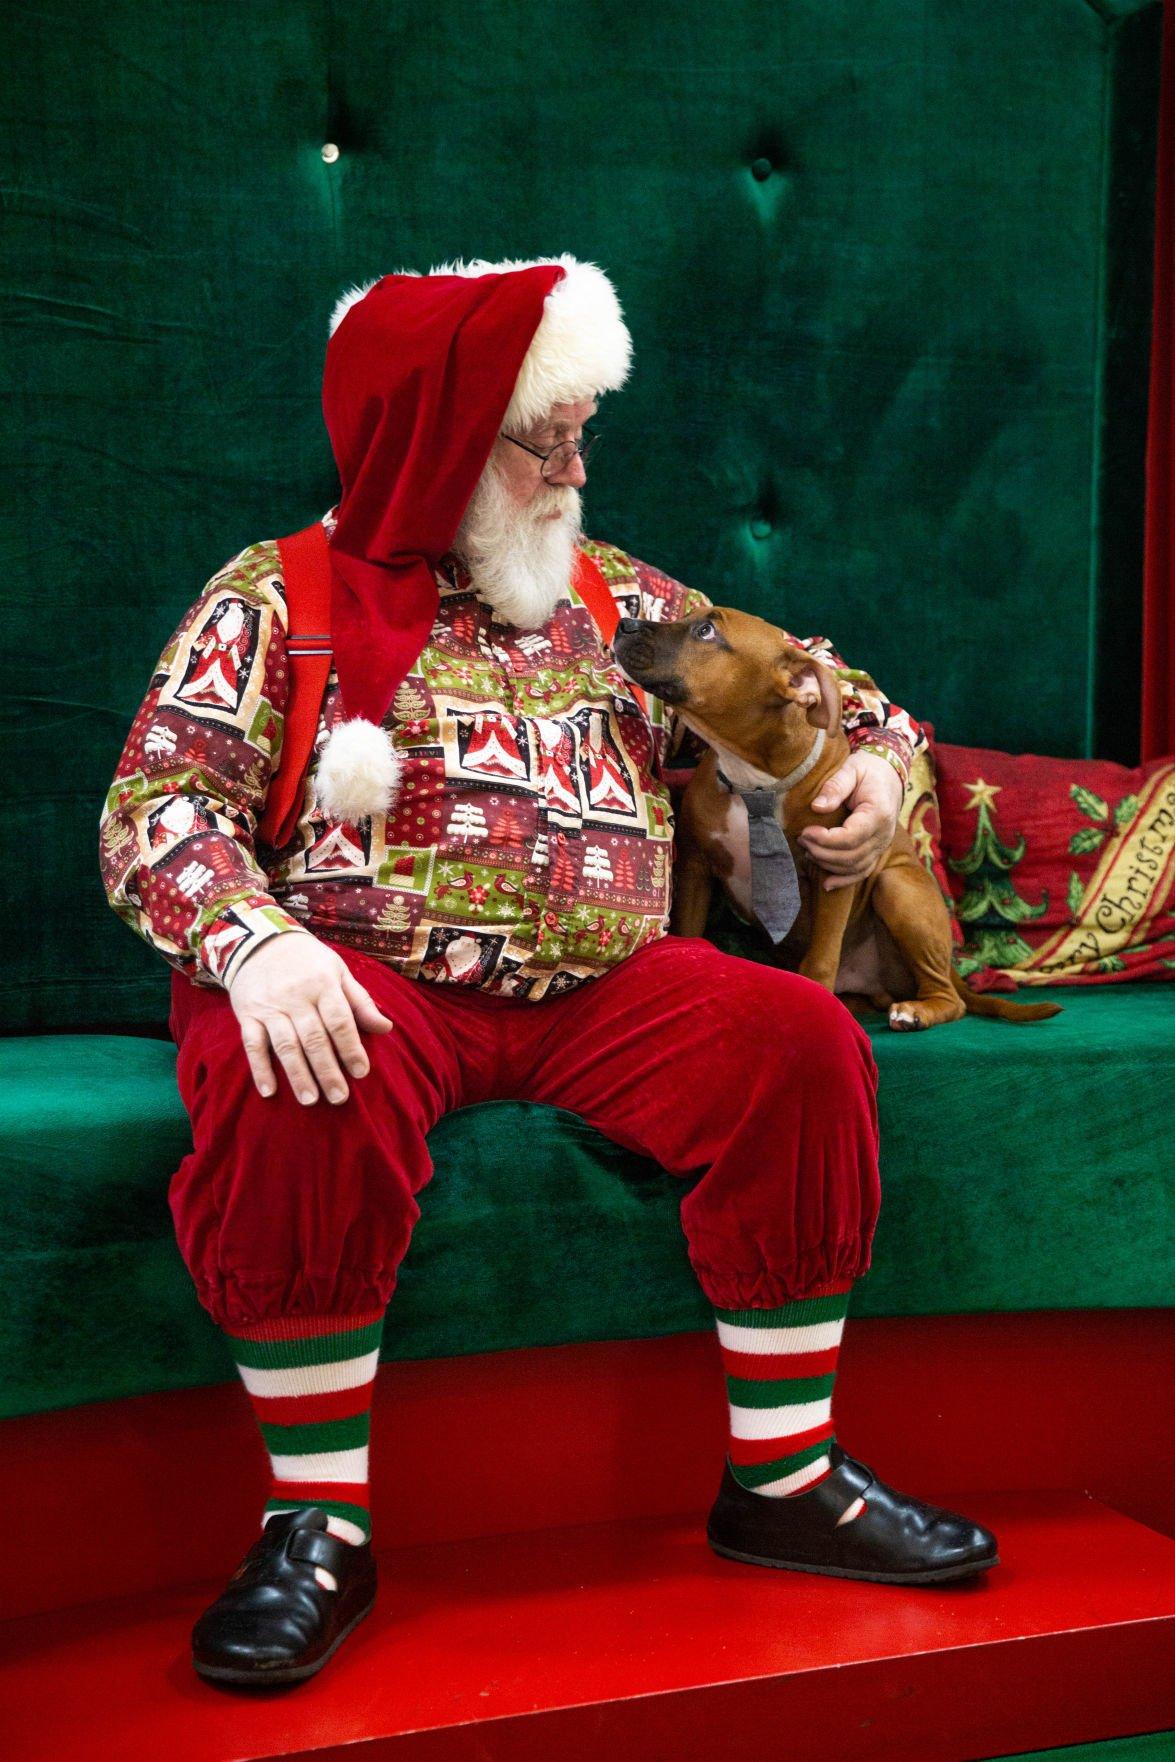 Furry friends meet Santa Claus at Greenwood Mall